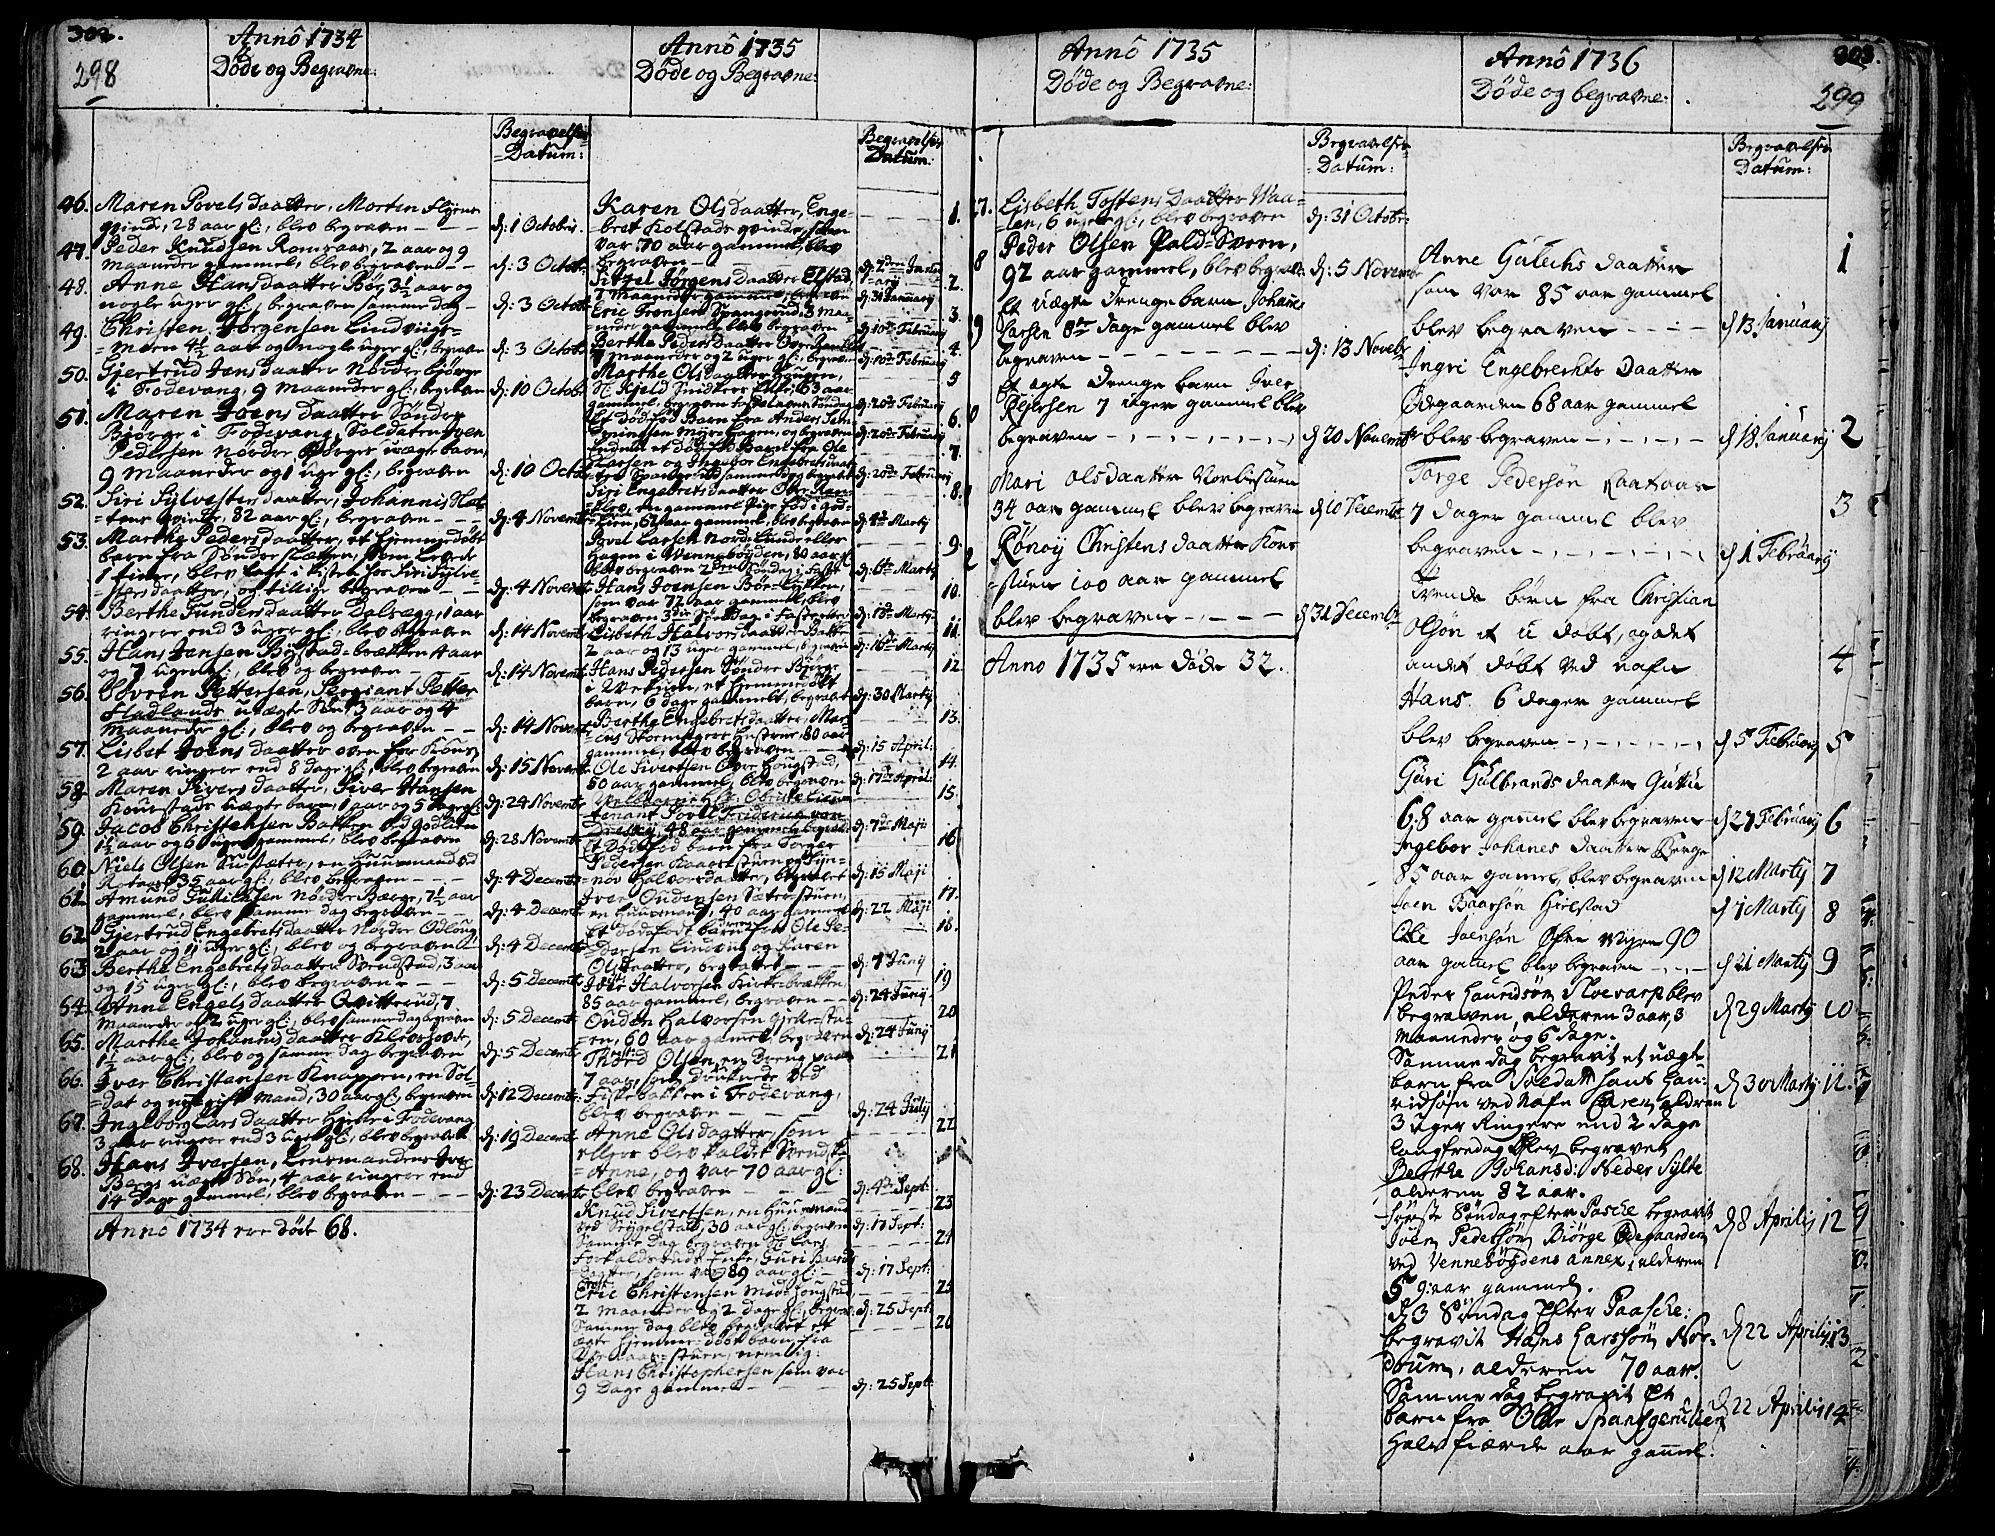 SAH, Ringebu prestekontor, Ministerialbok nr. 2, 1734-1780, s. 298-299